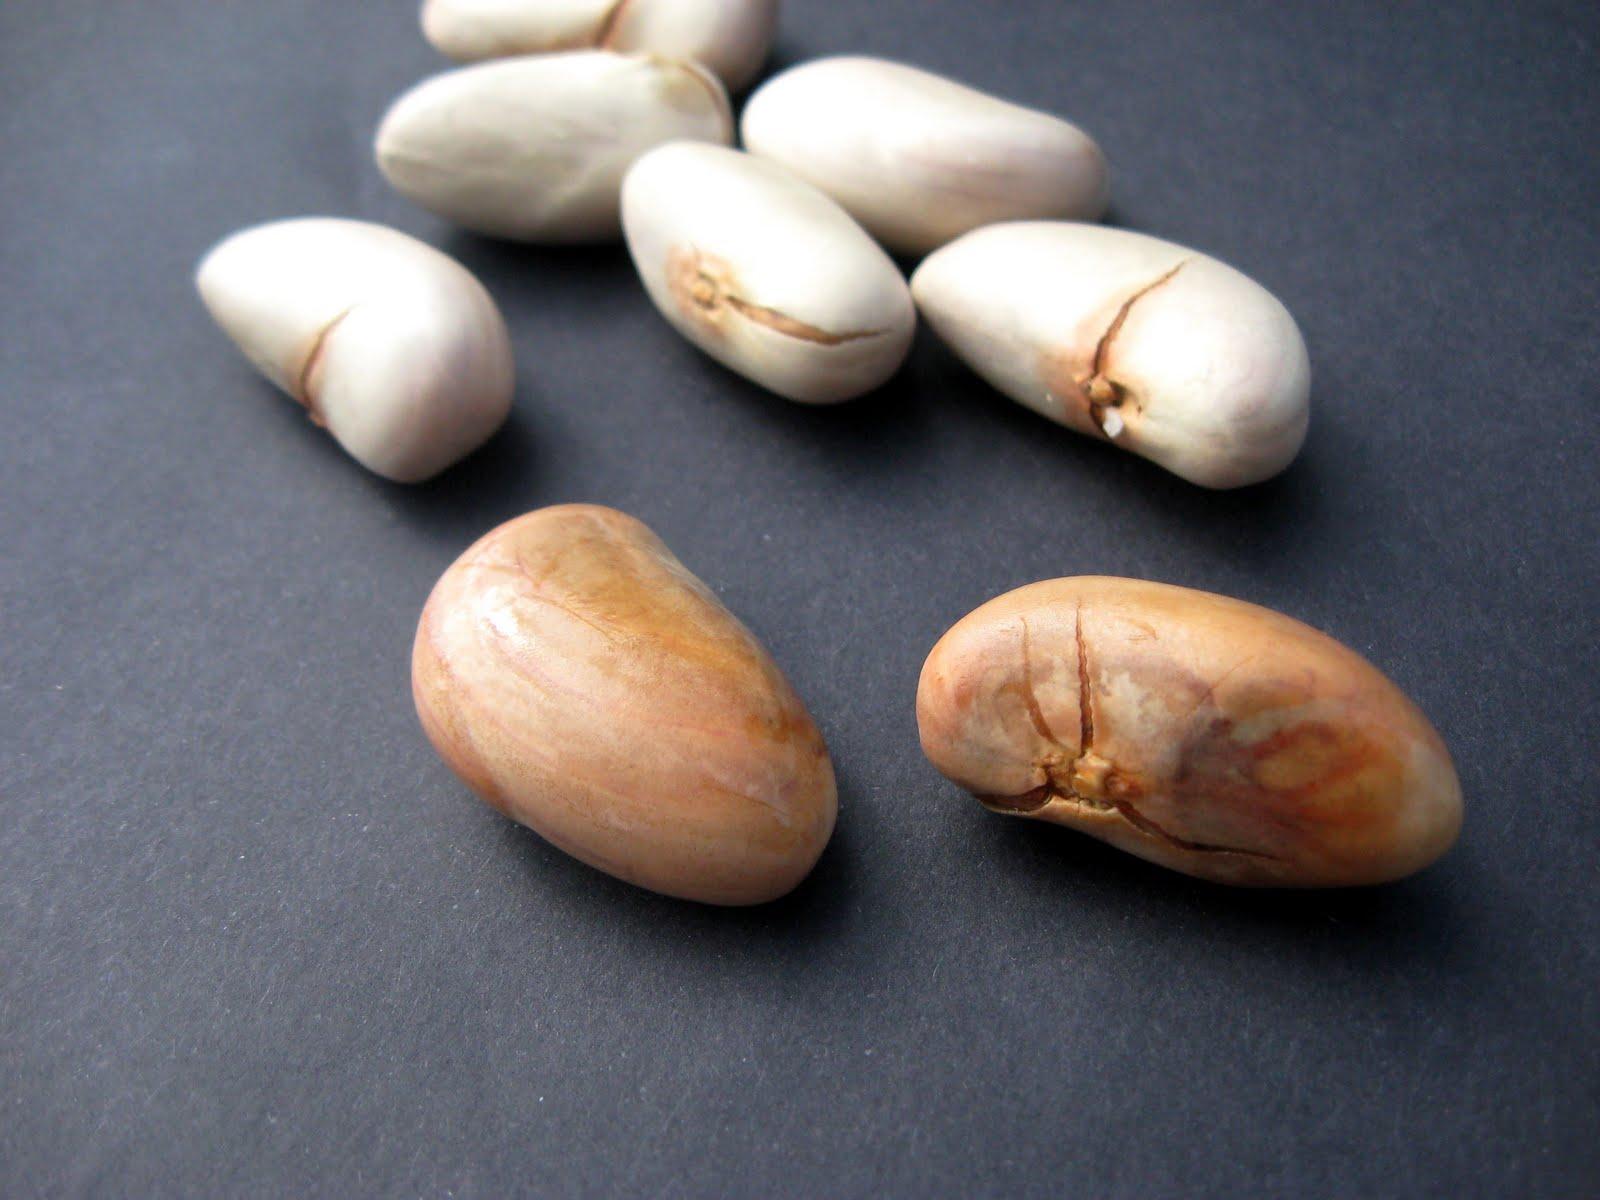 Taming Health Jackfruit Seeds And Honey